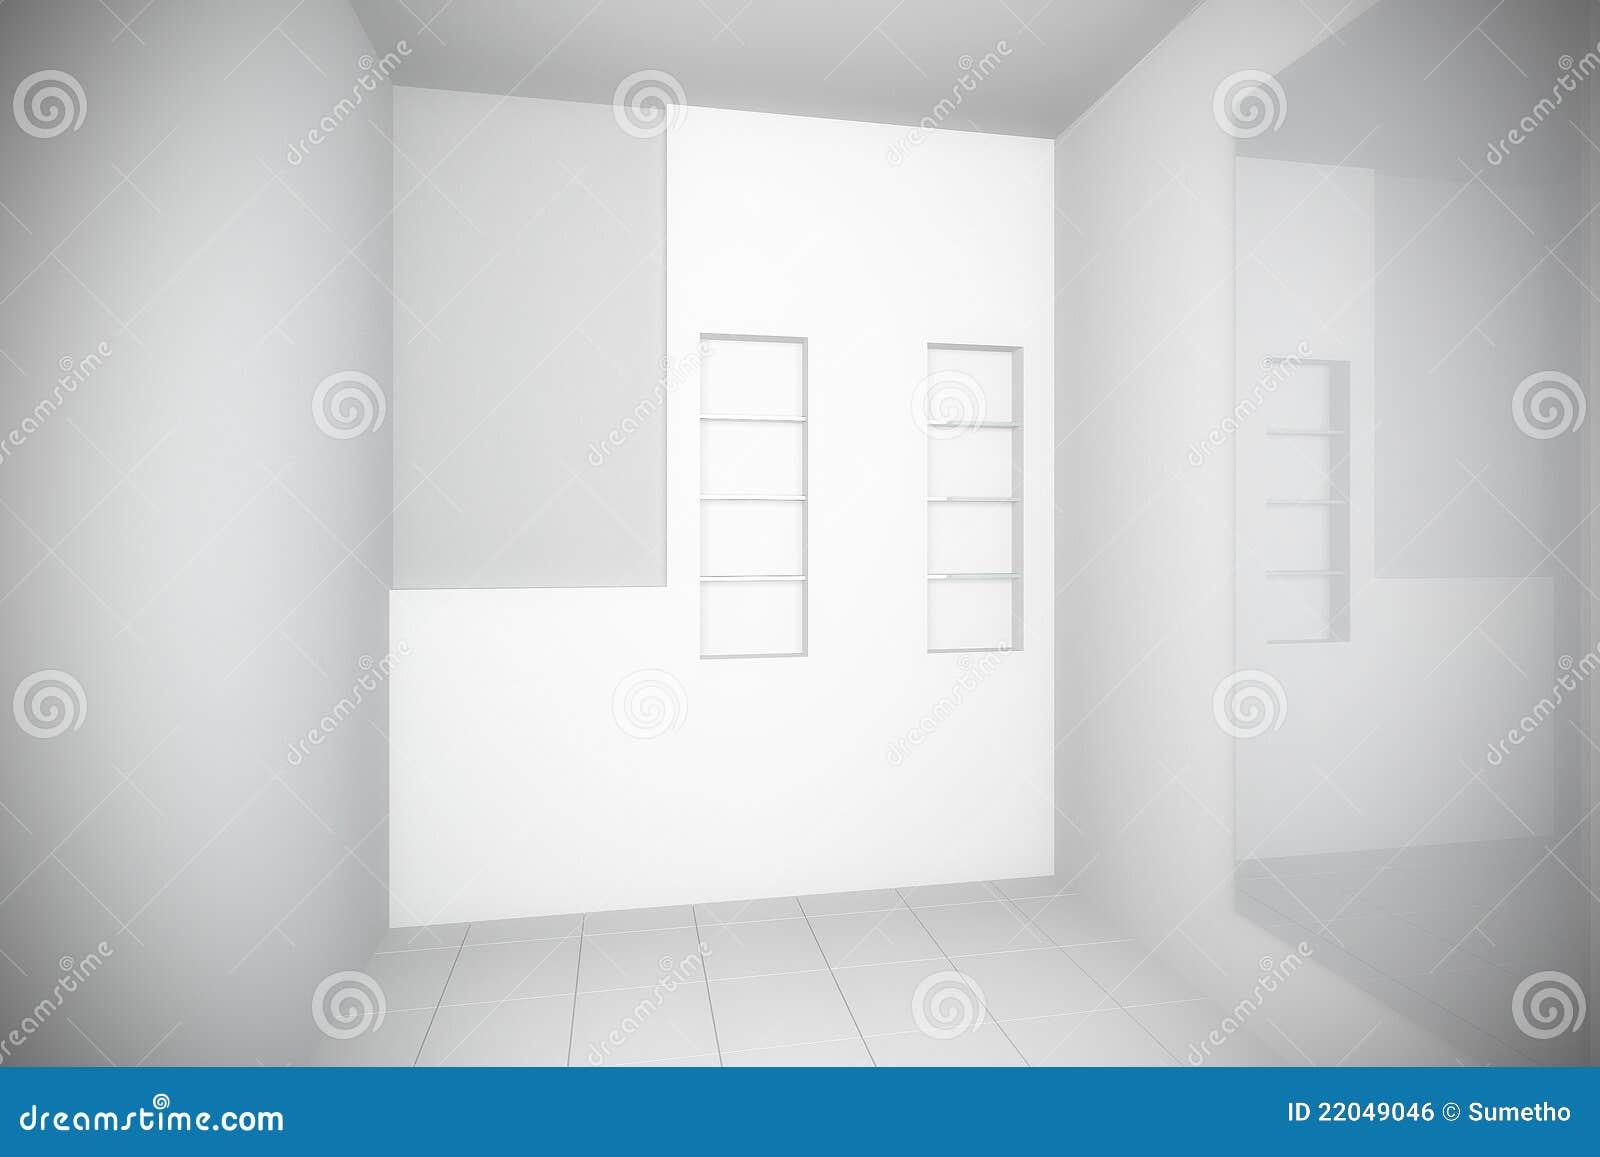 Empty Bathroom Interior With Tile Floor Royalty Free Stock